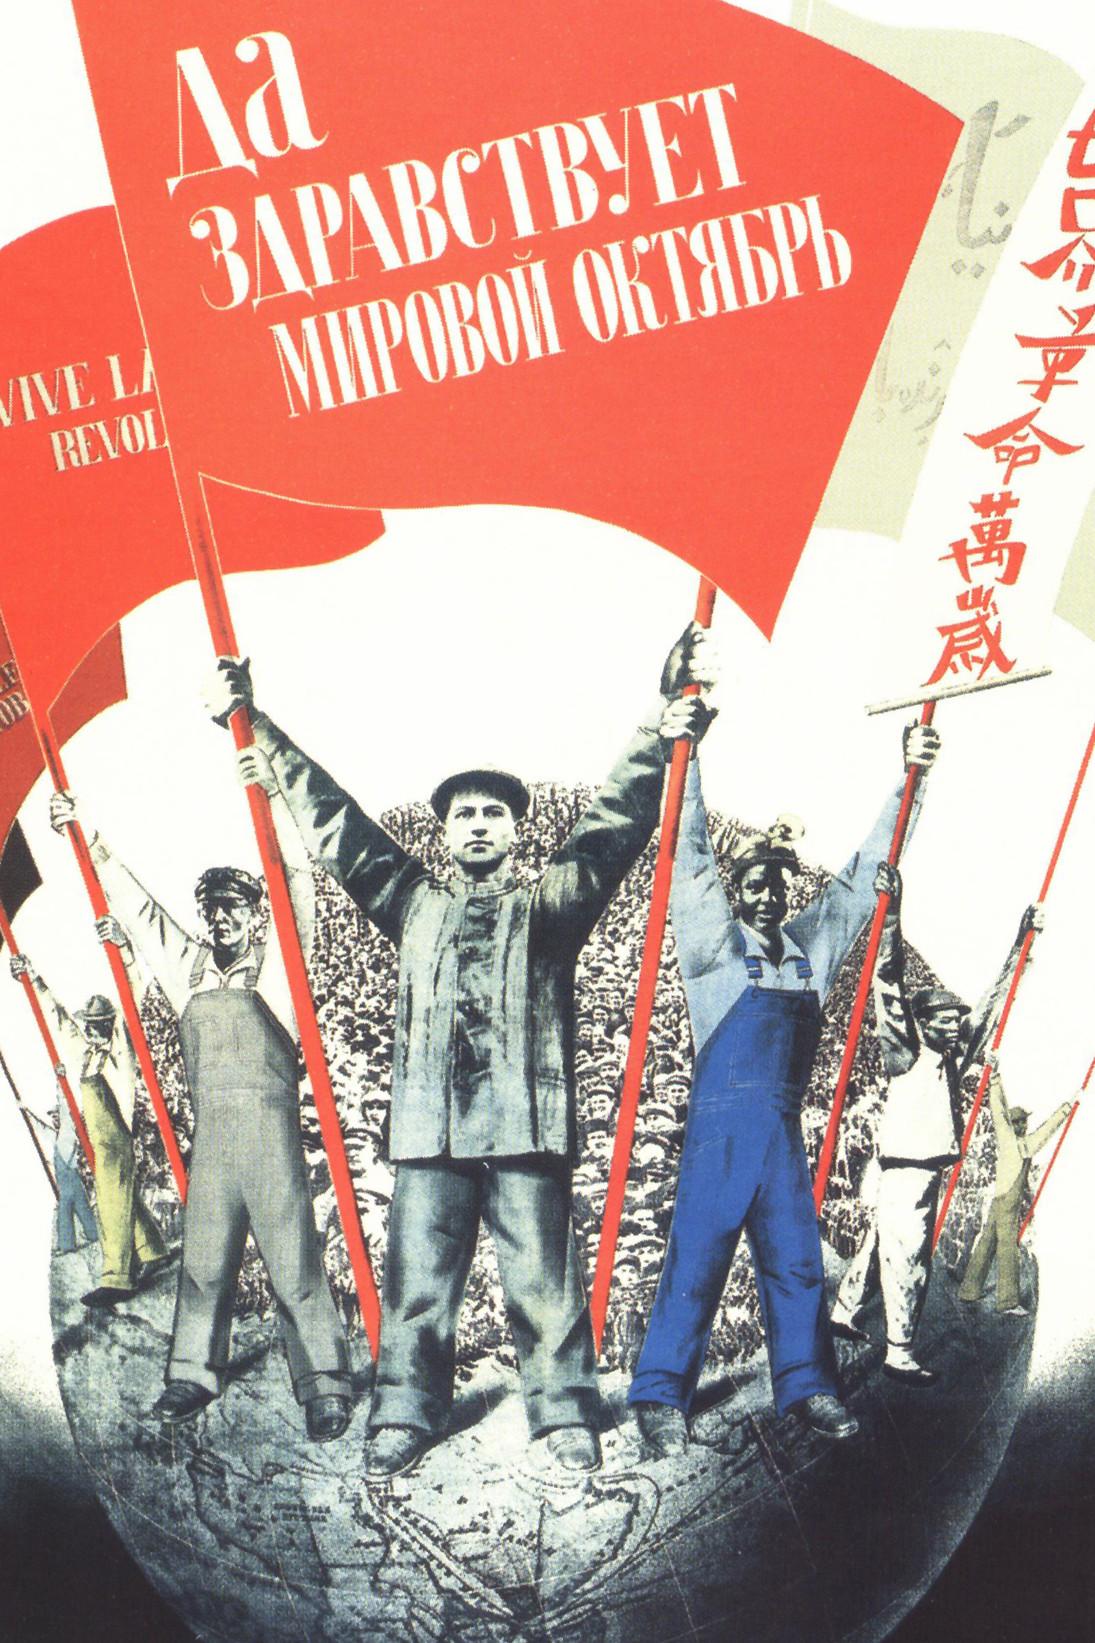 Internationalist Revolutionary Socialist May Day Statement 2018